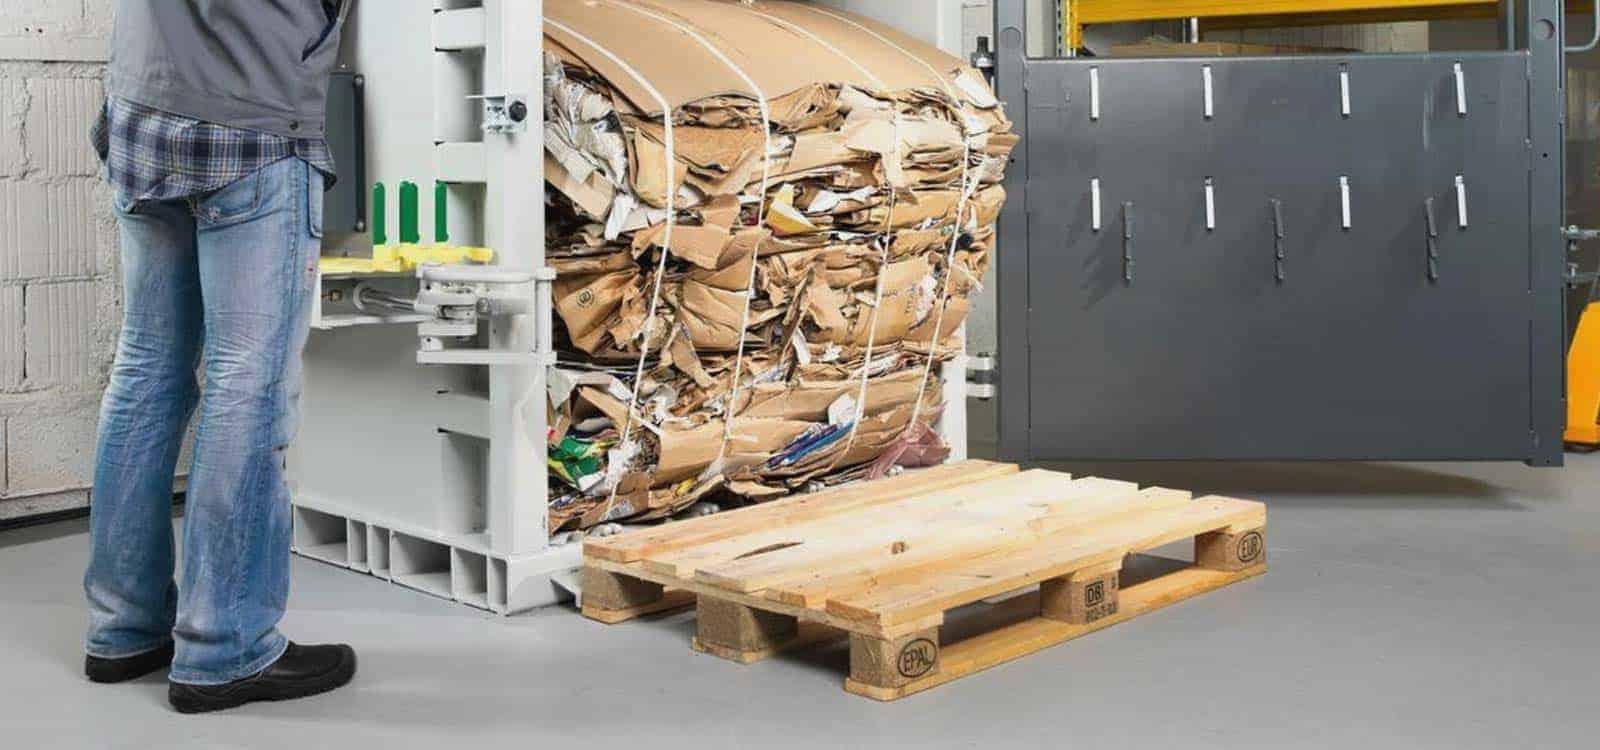 cardboard-baler-press-compactor